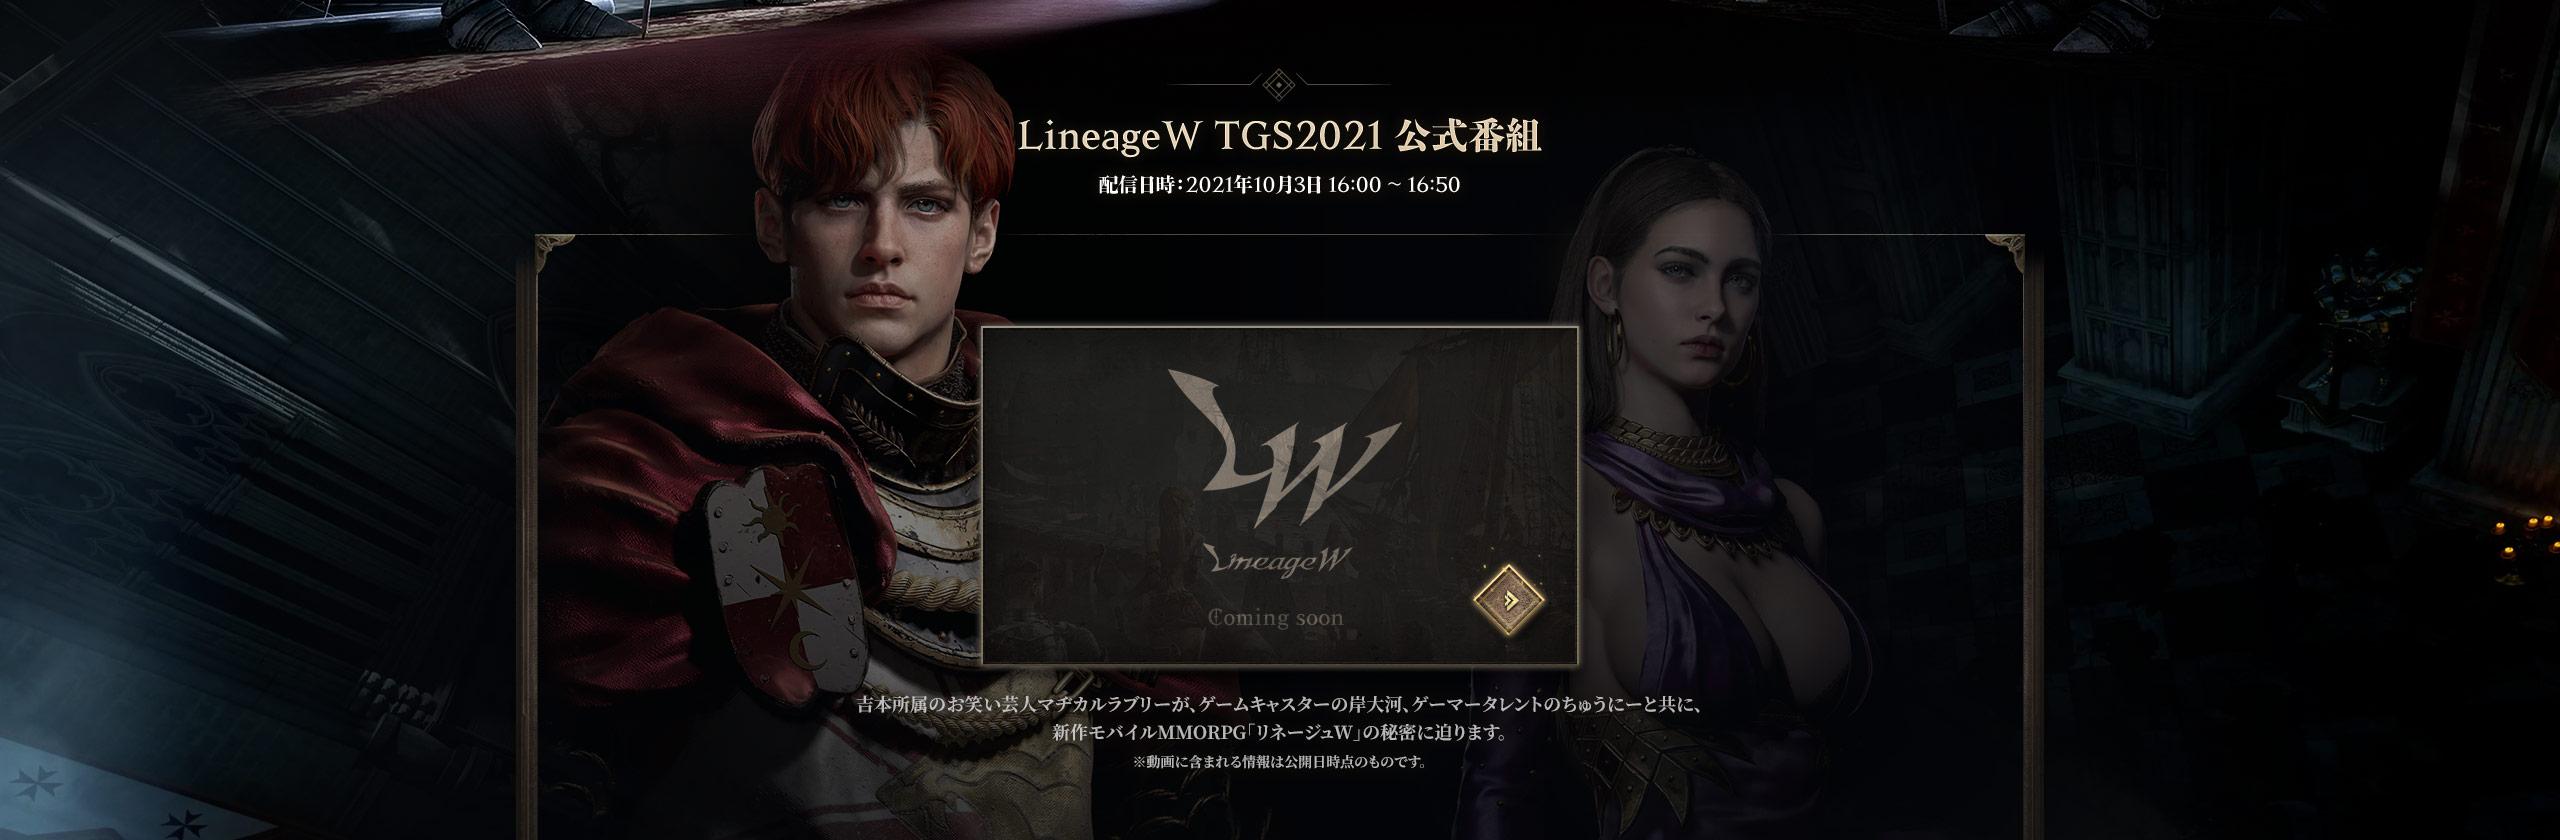 LineageW TGS2021 公式番組